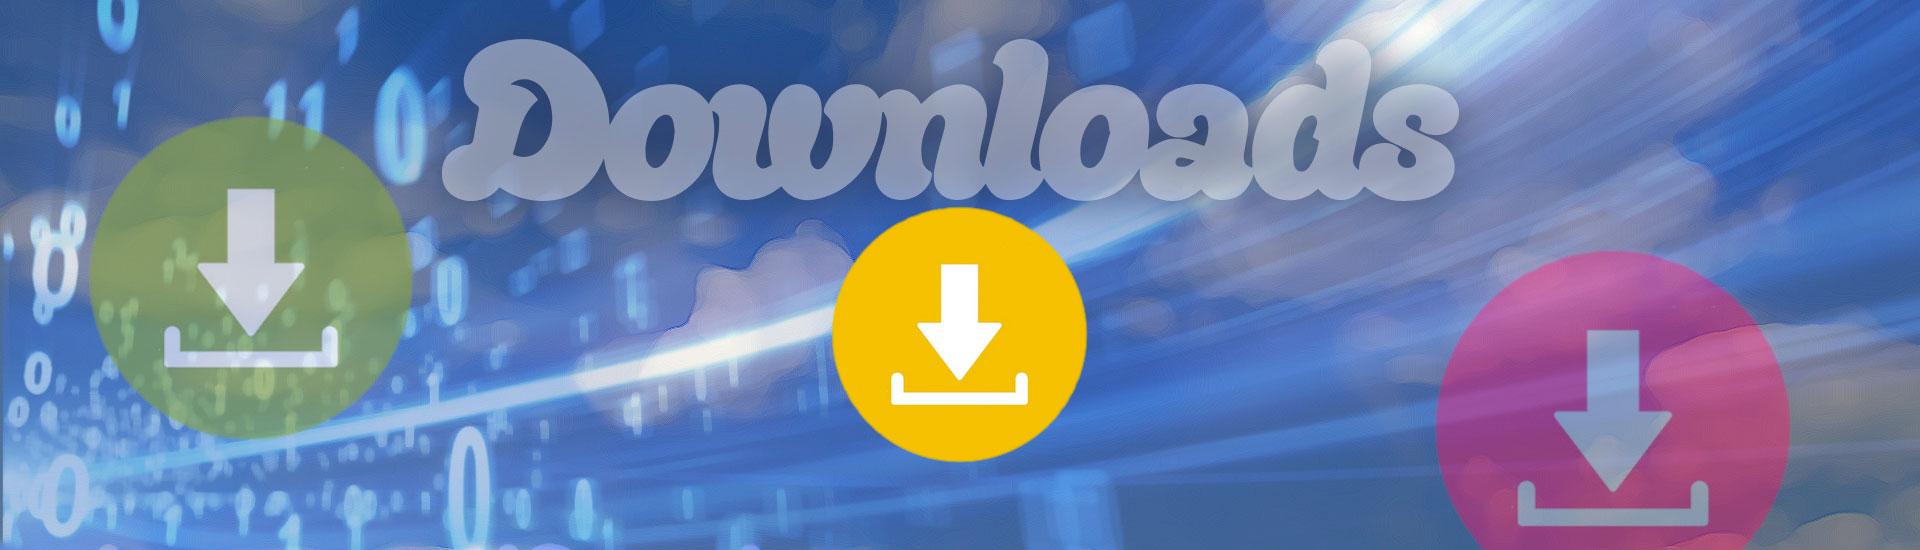 downloads_meffert_header